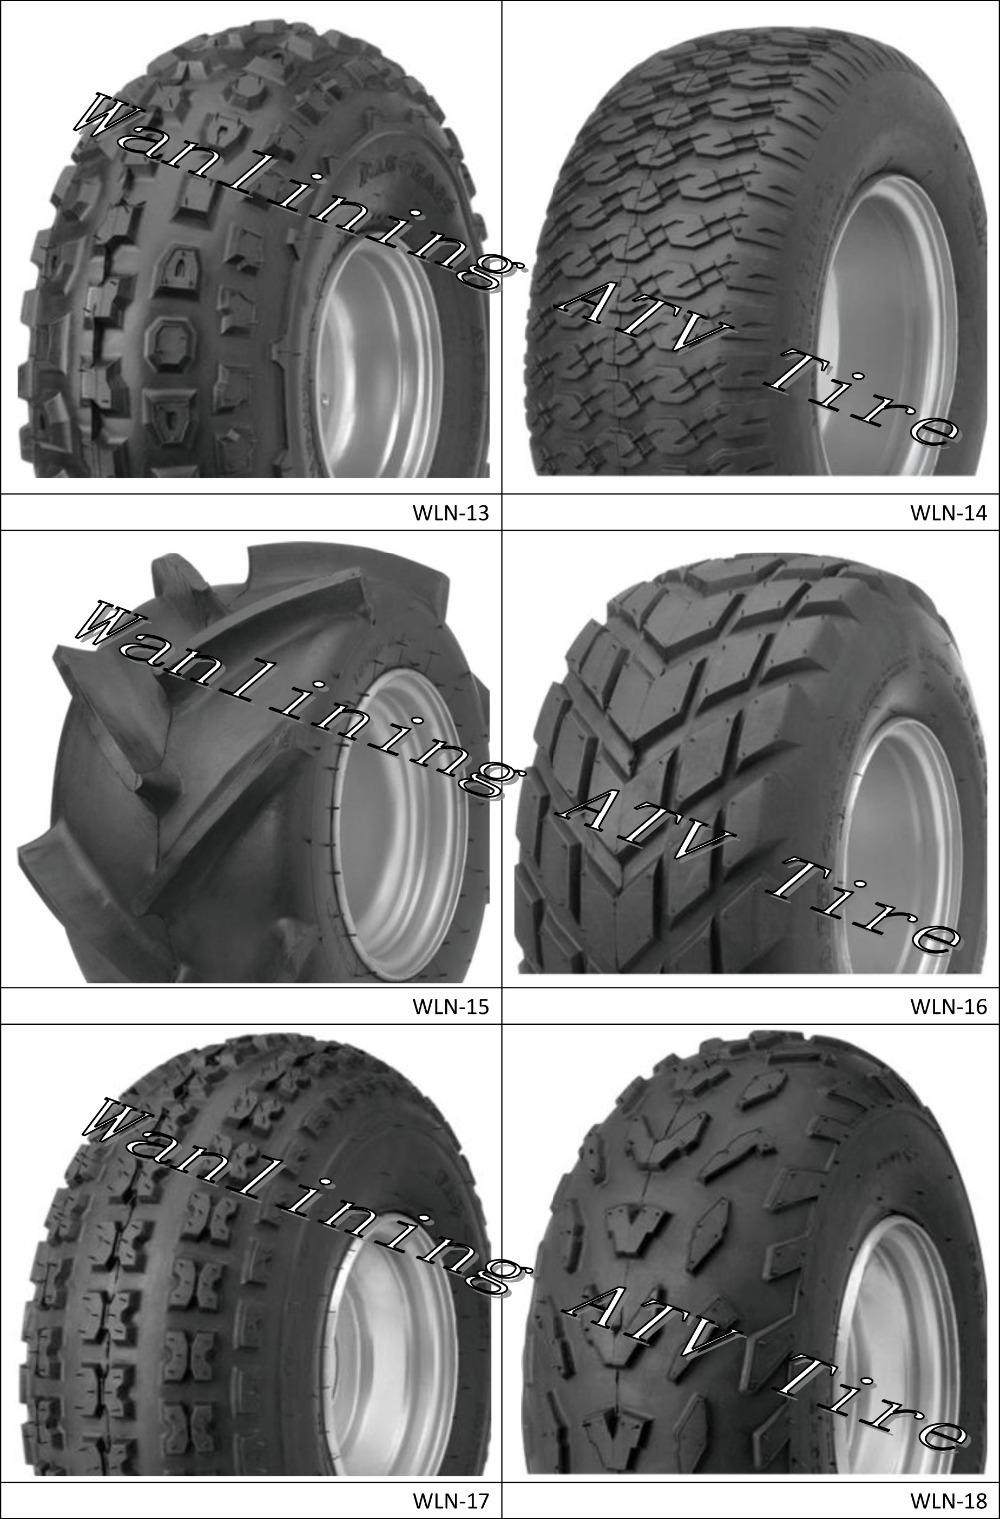 China Four Wheel Bike Atv Tires 16x8 7 Buy Atv Tires